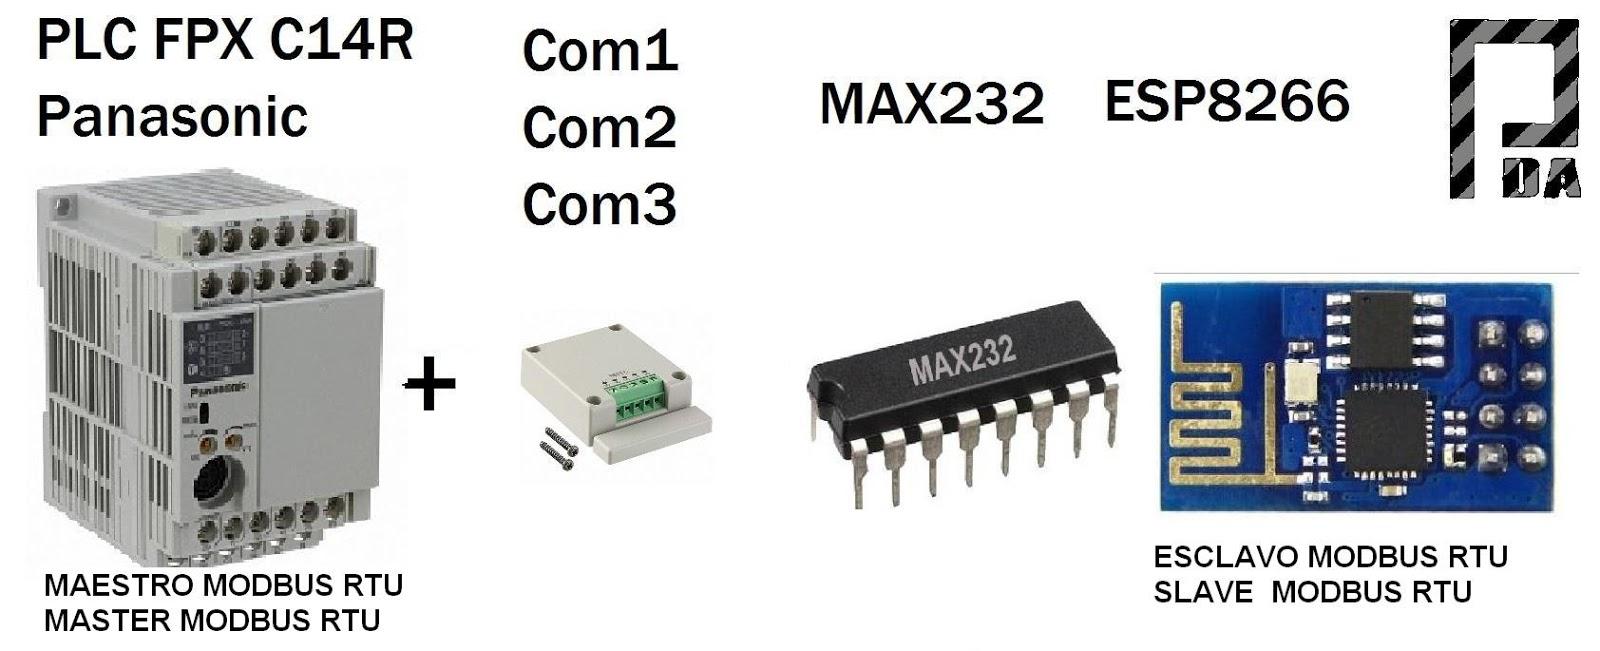 Esp8266 Scada Svg Modbus Rtu Display Oled Plc Panasonic Fpx C14r Ttl Level 8211 Rs232 Converter By Max232 Pdacontrol